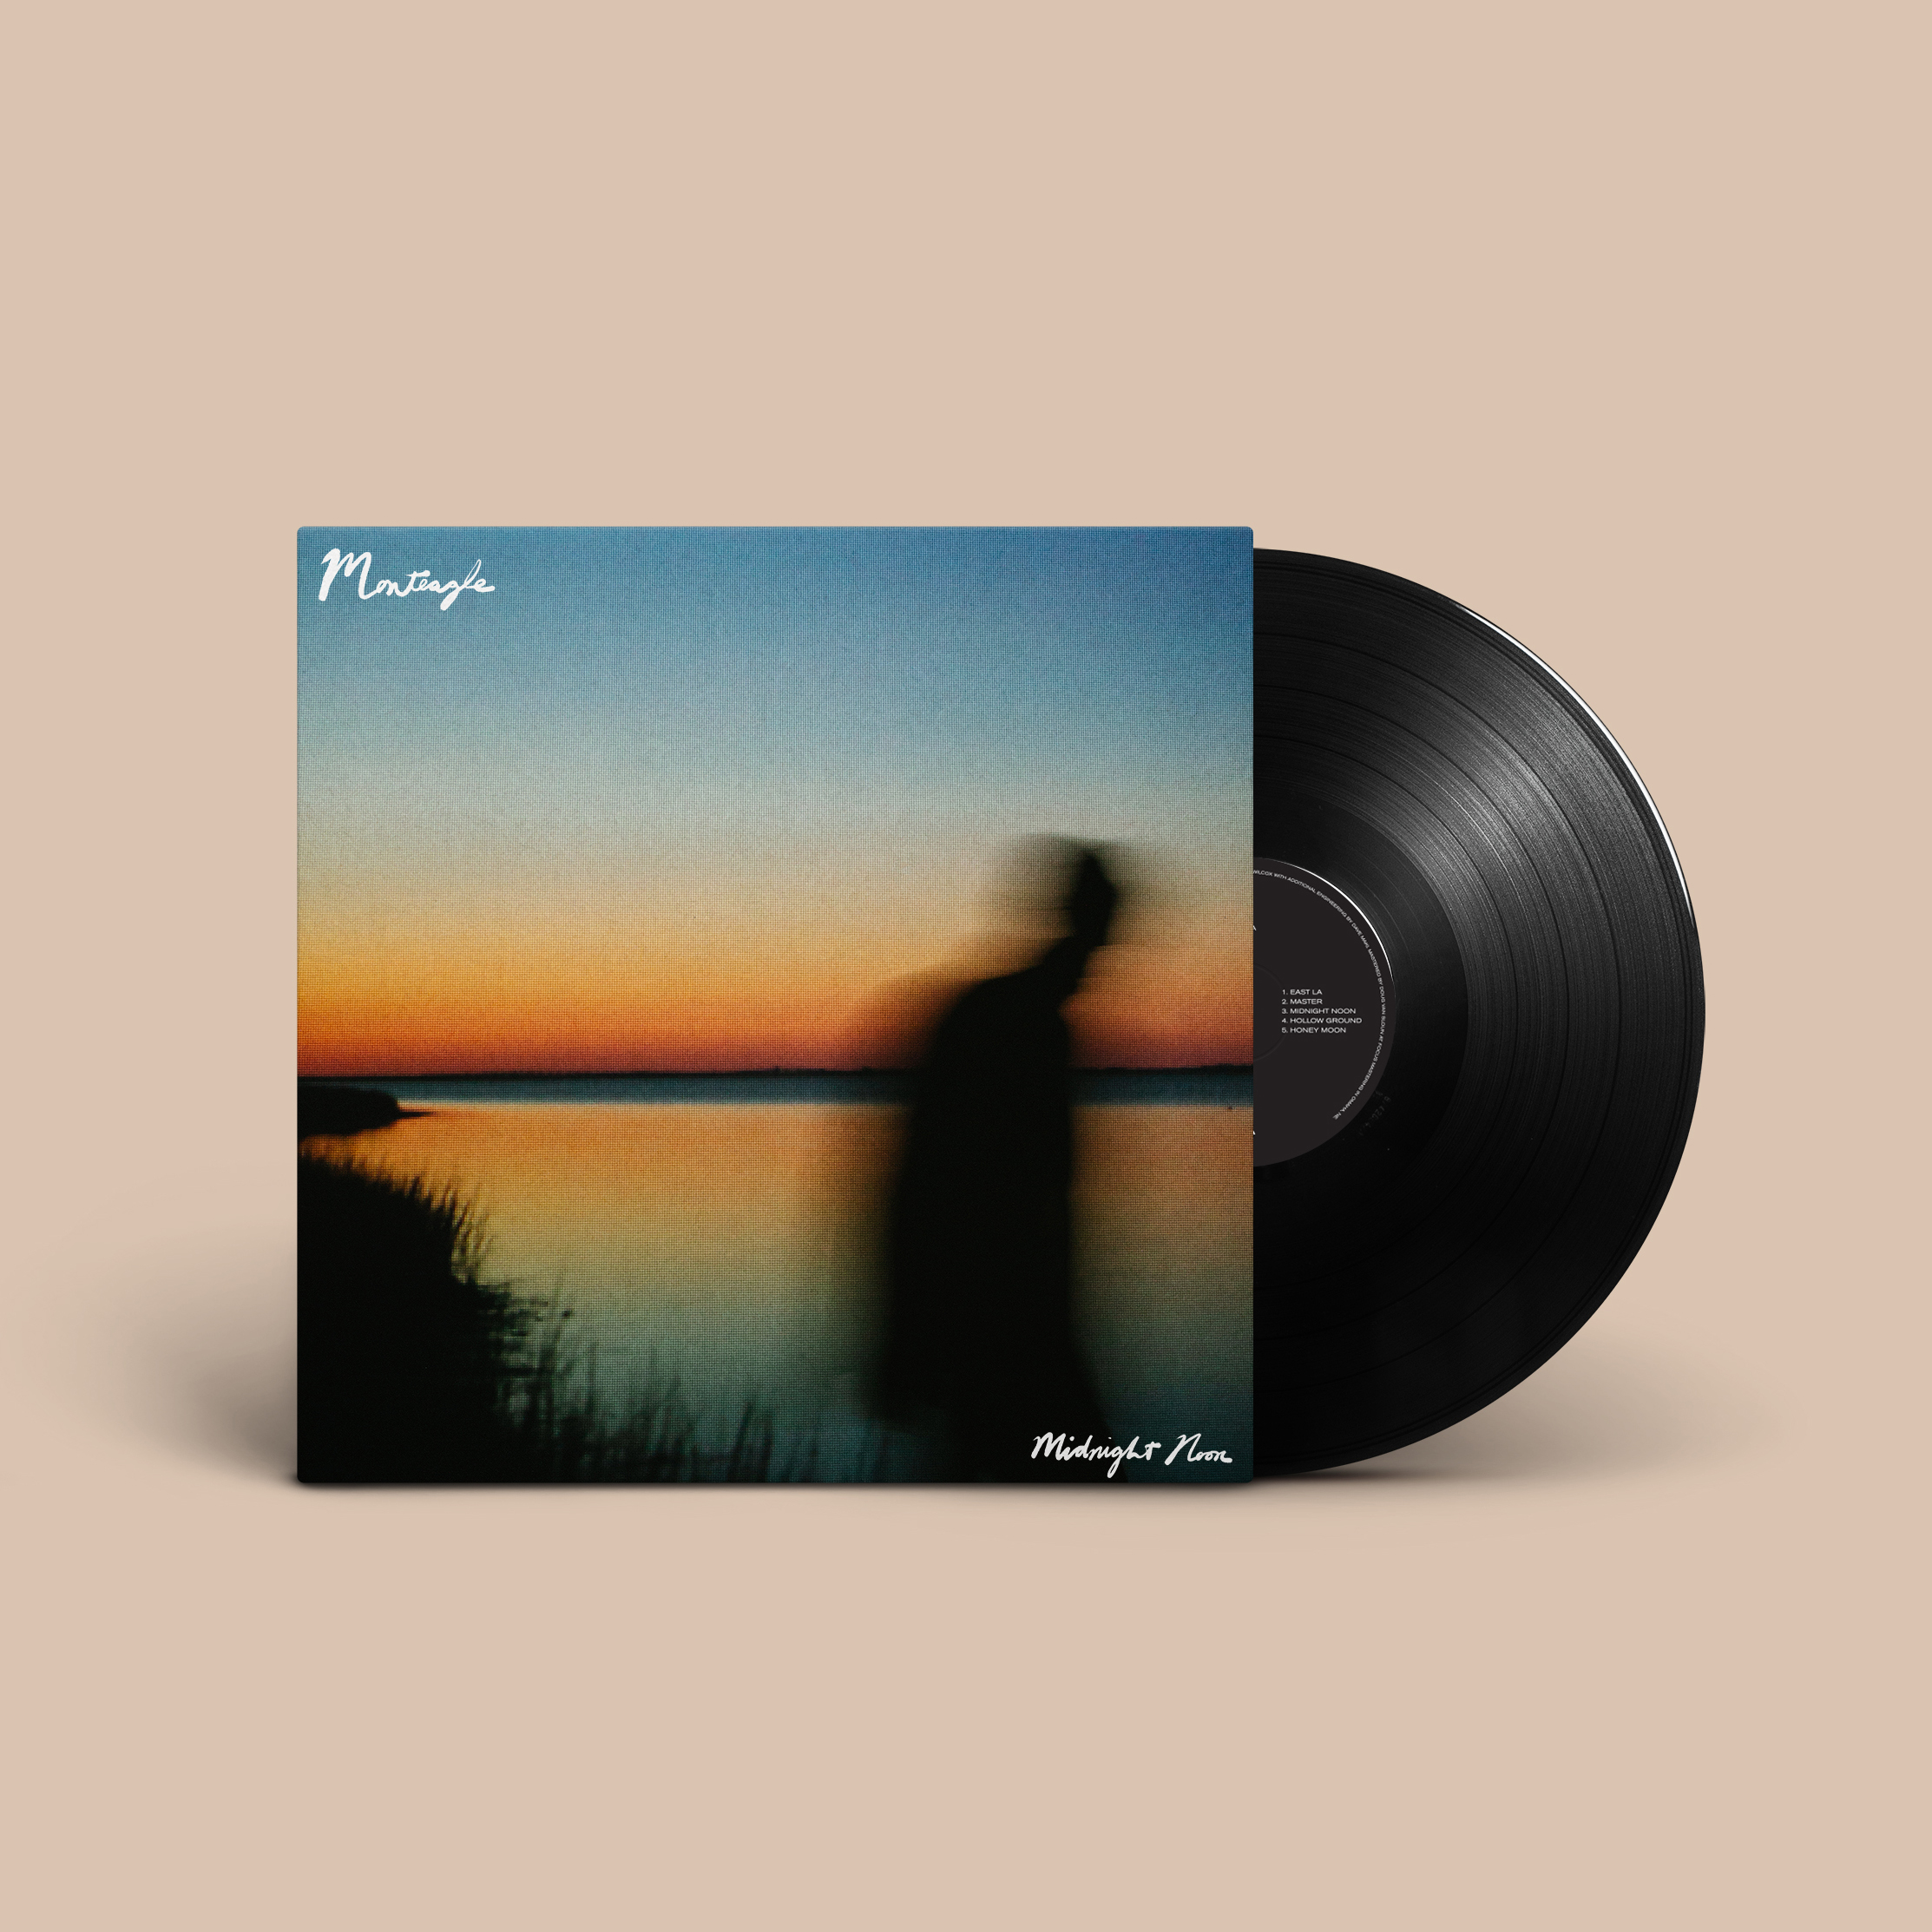 Monteagle-record.jpg